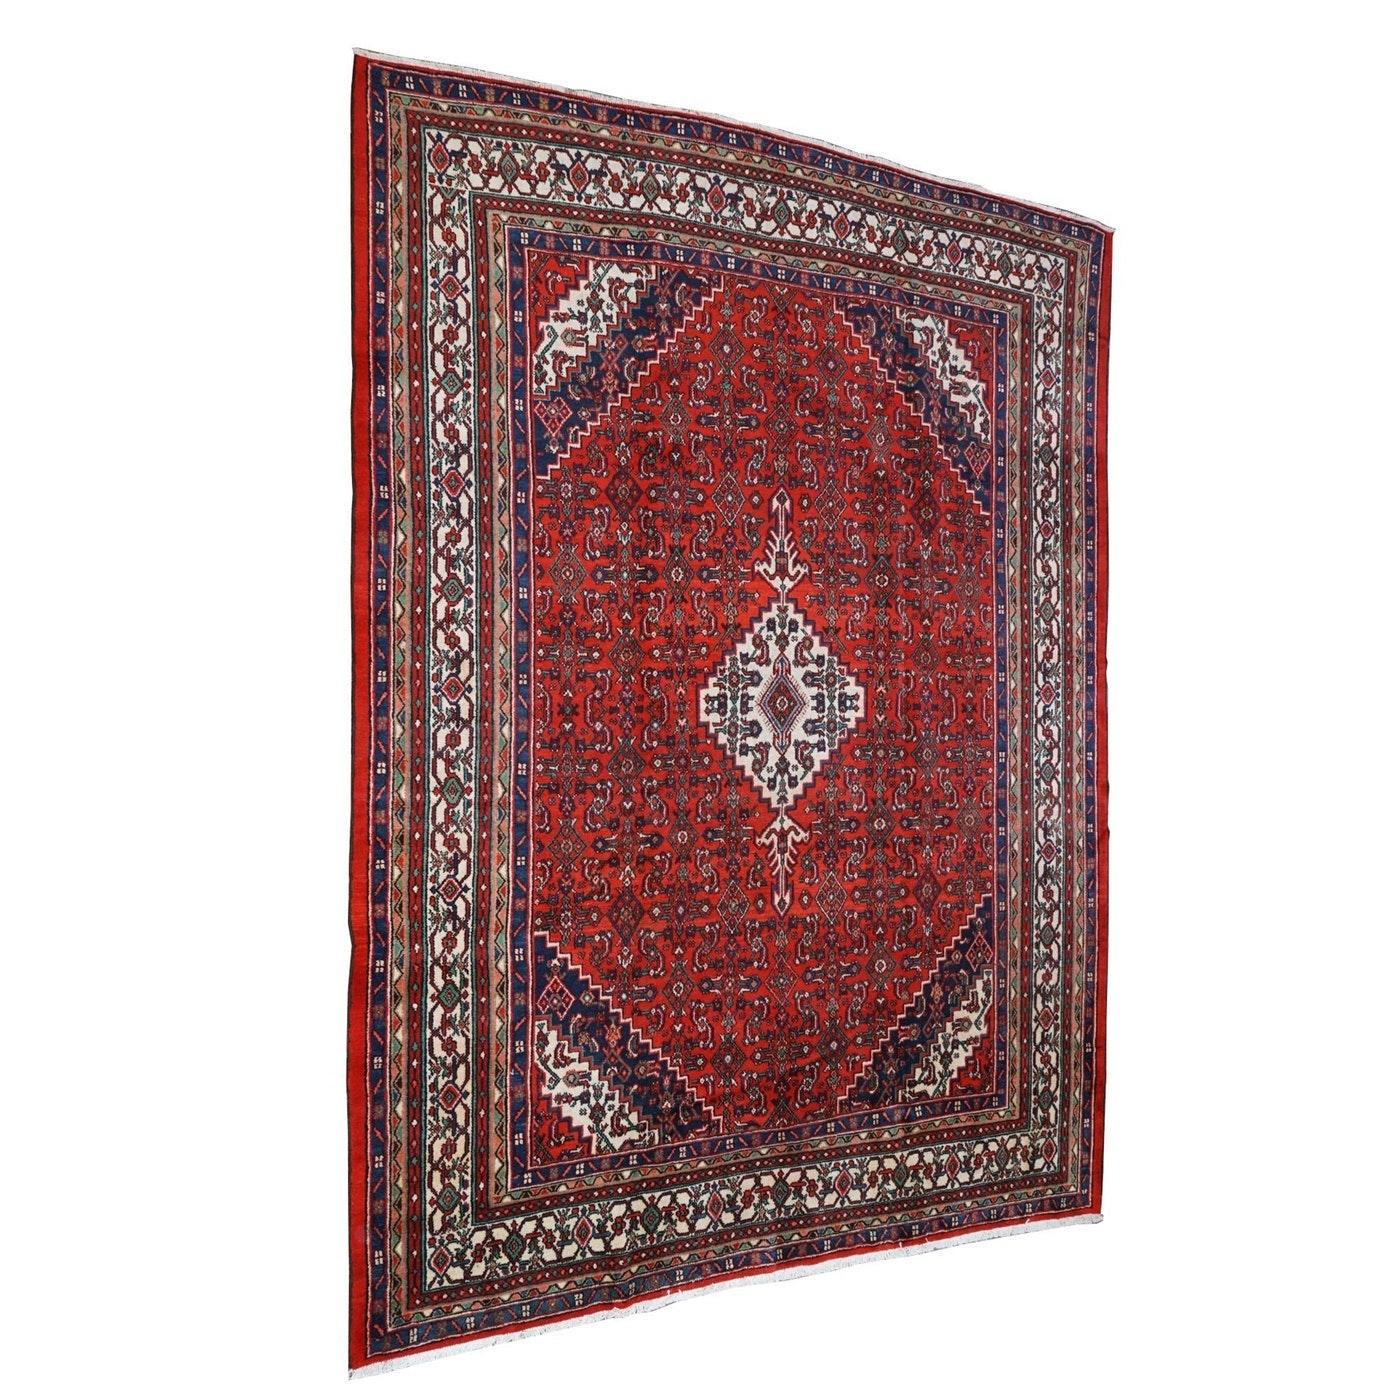 Hand-Knotted Kurdish Gogarjin Wool Room Sized Rug